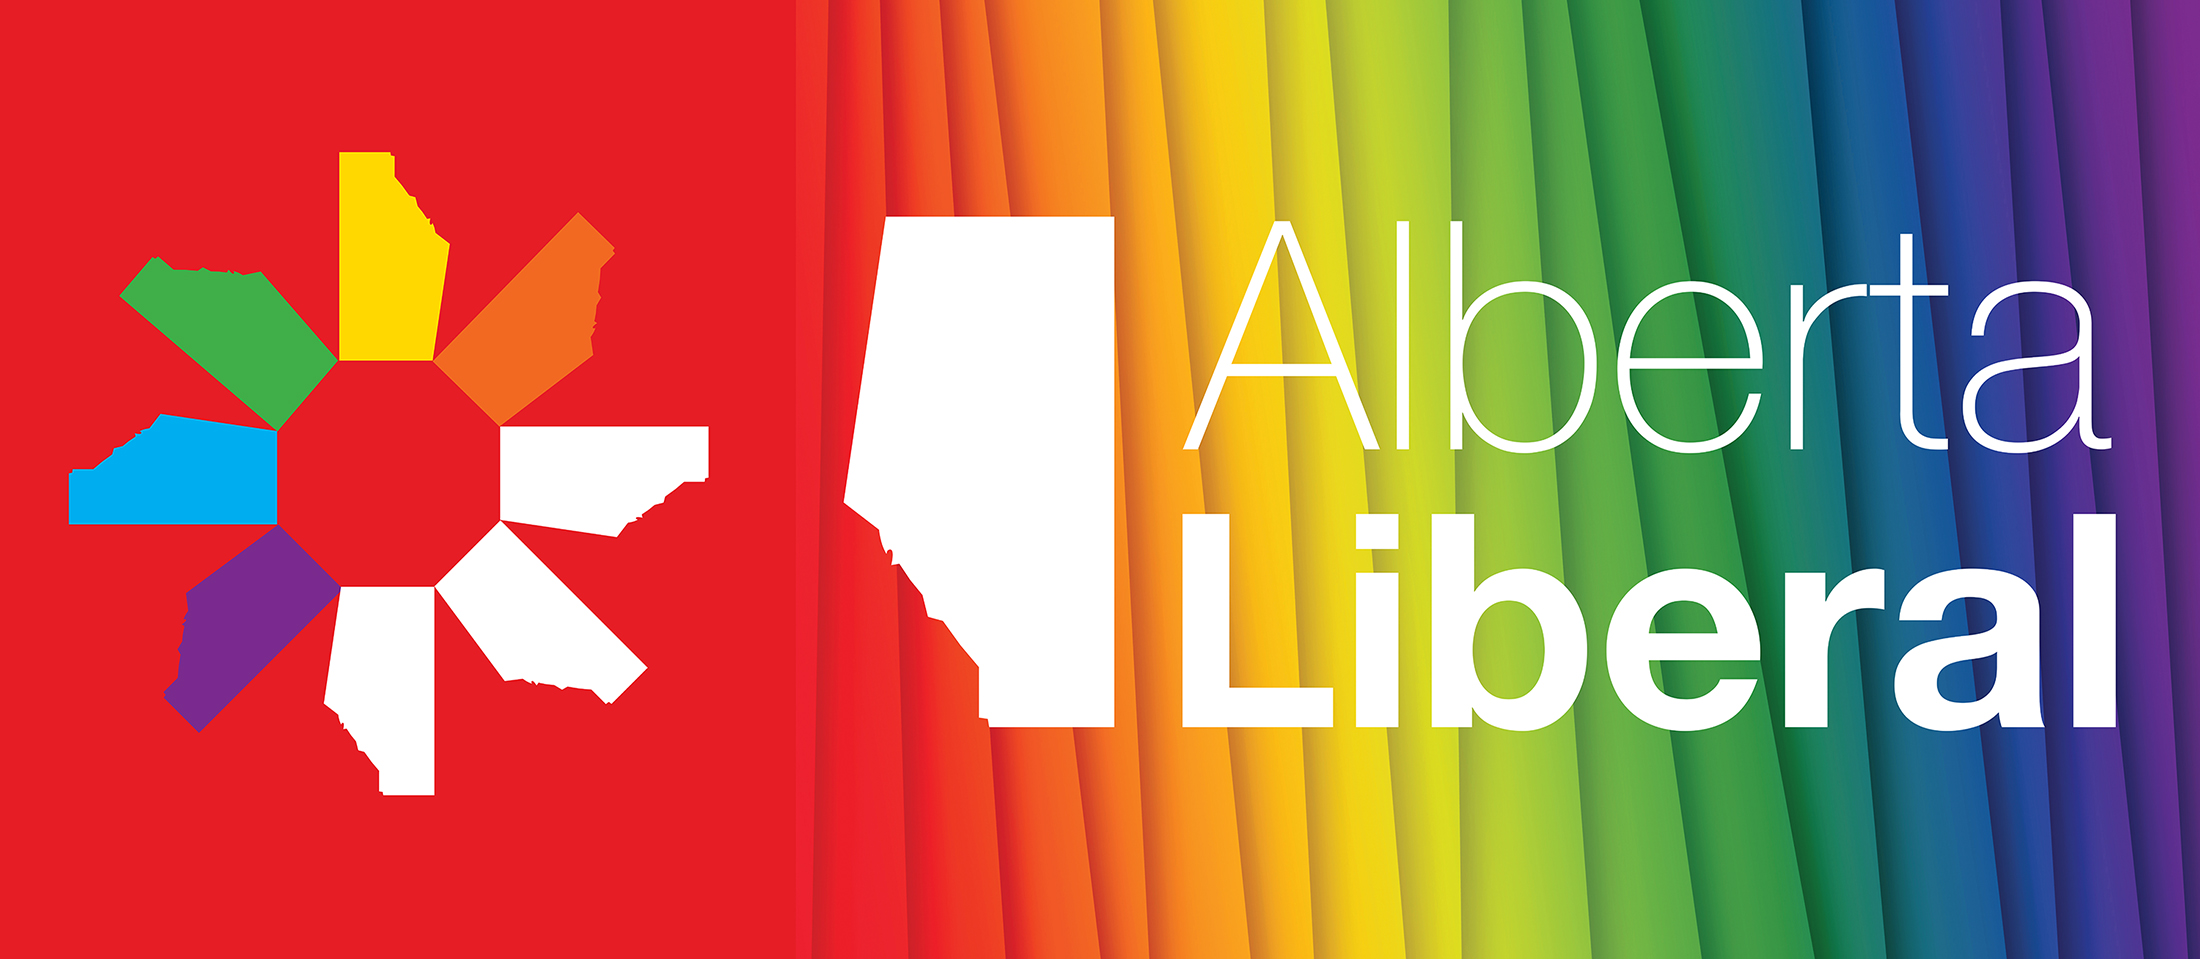 Liberal_Pride_Banner_2016_sm.jpg